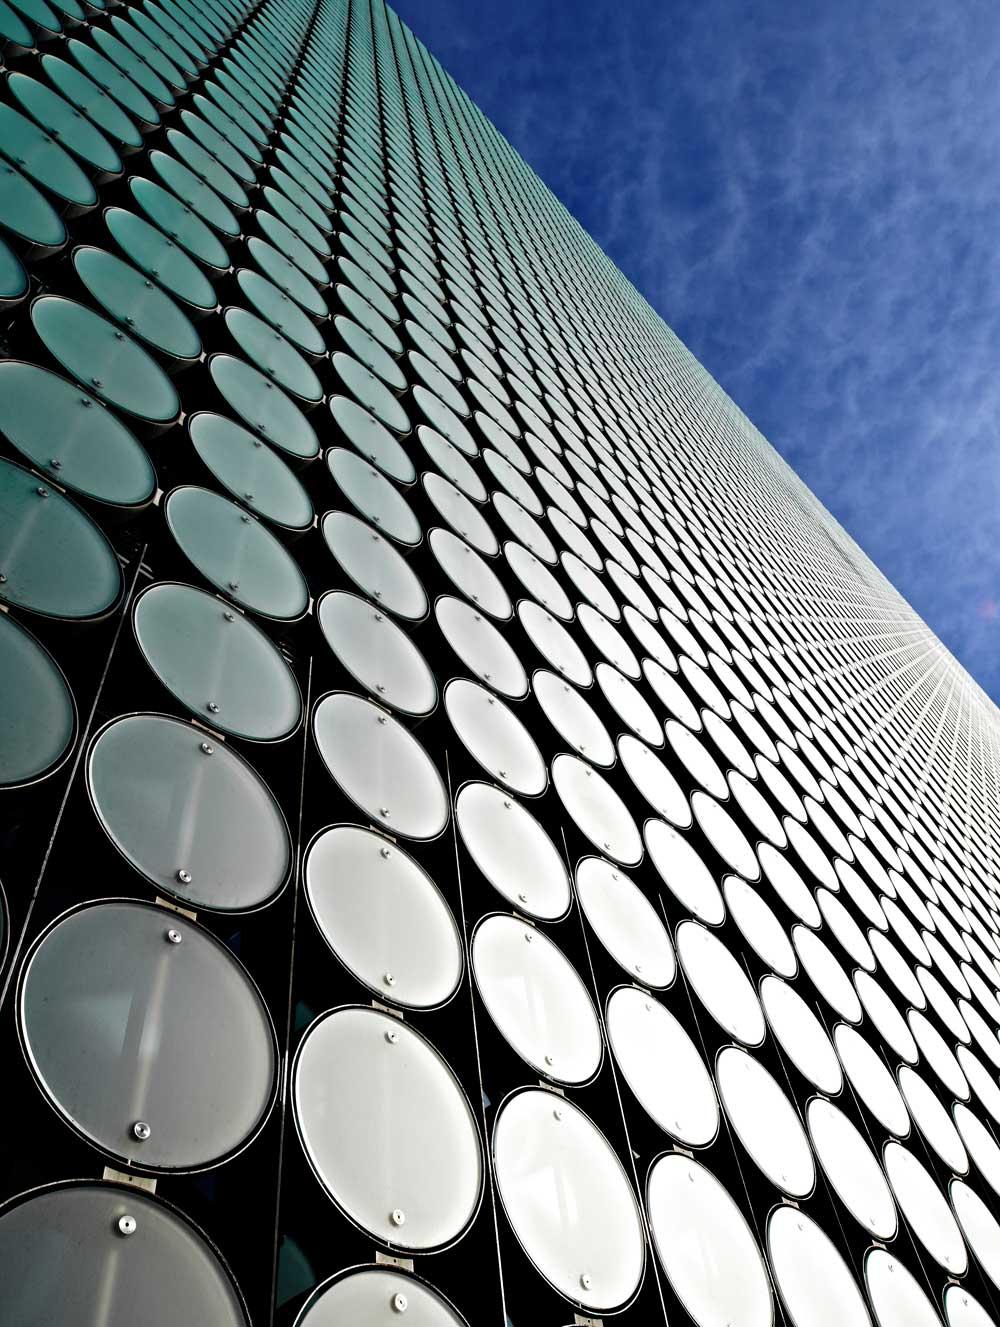 RMIT Design Hub in Melbourne